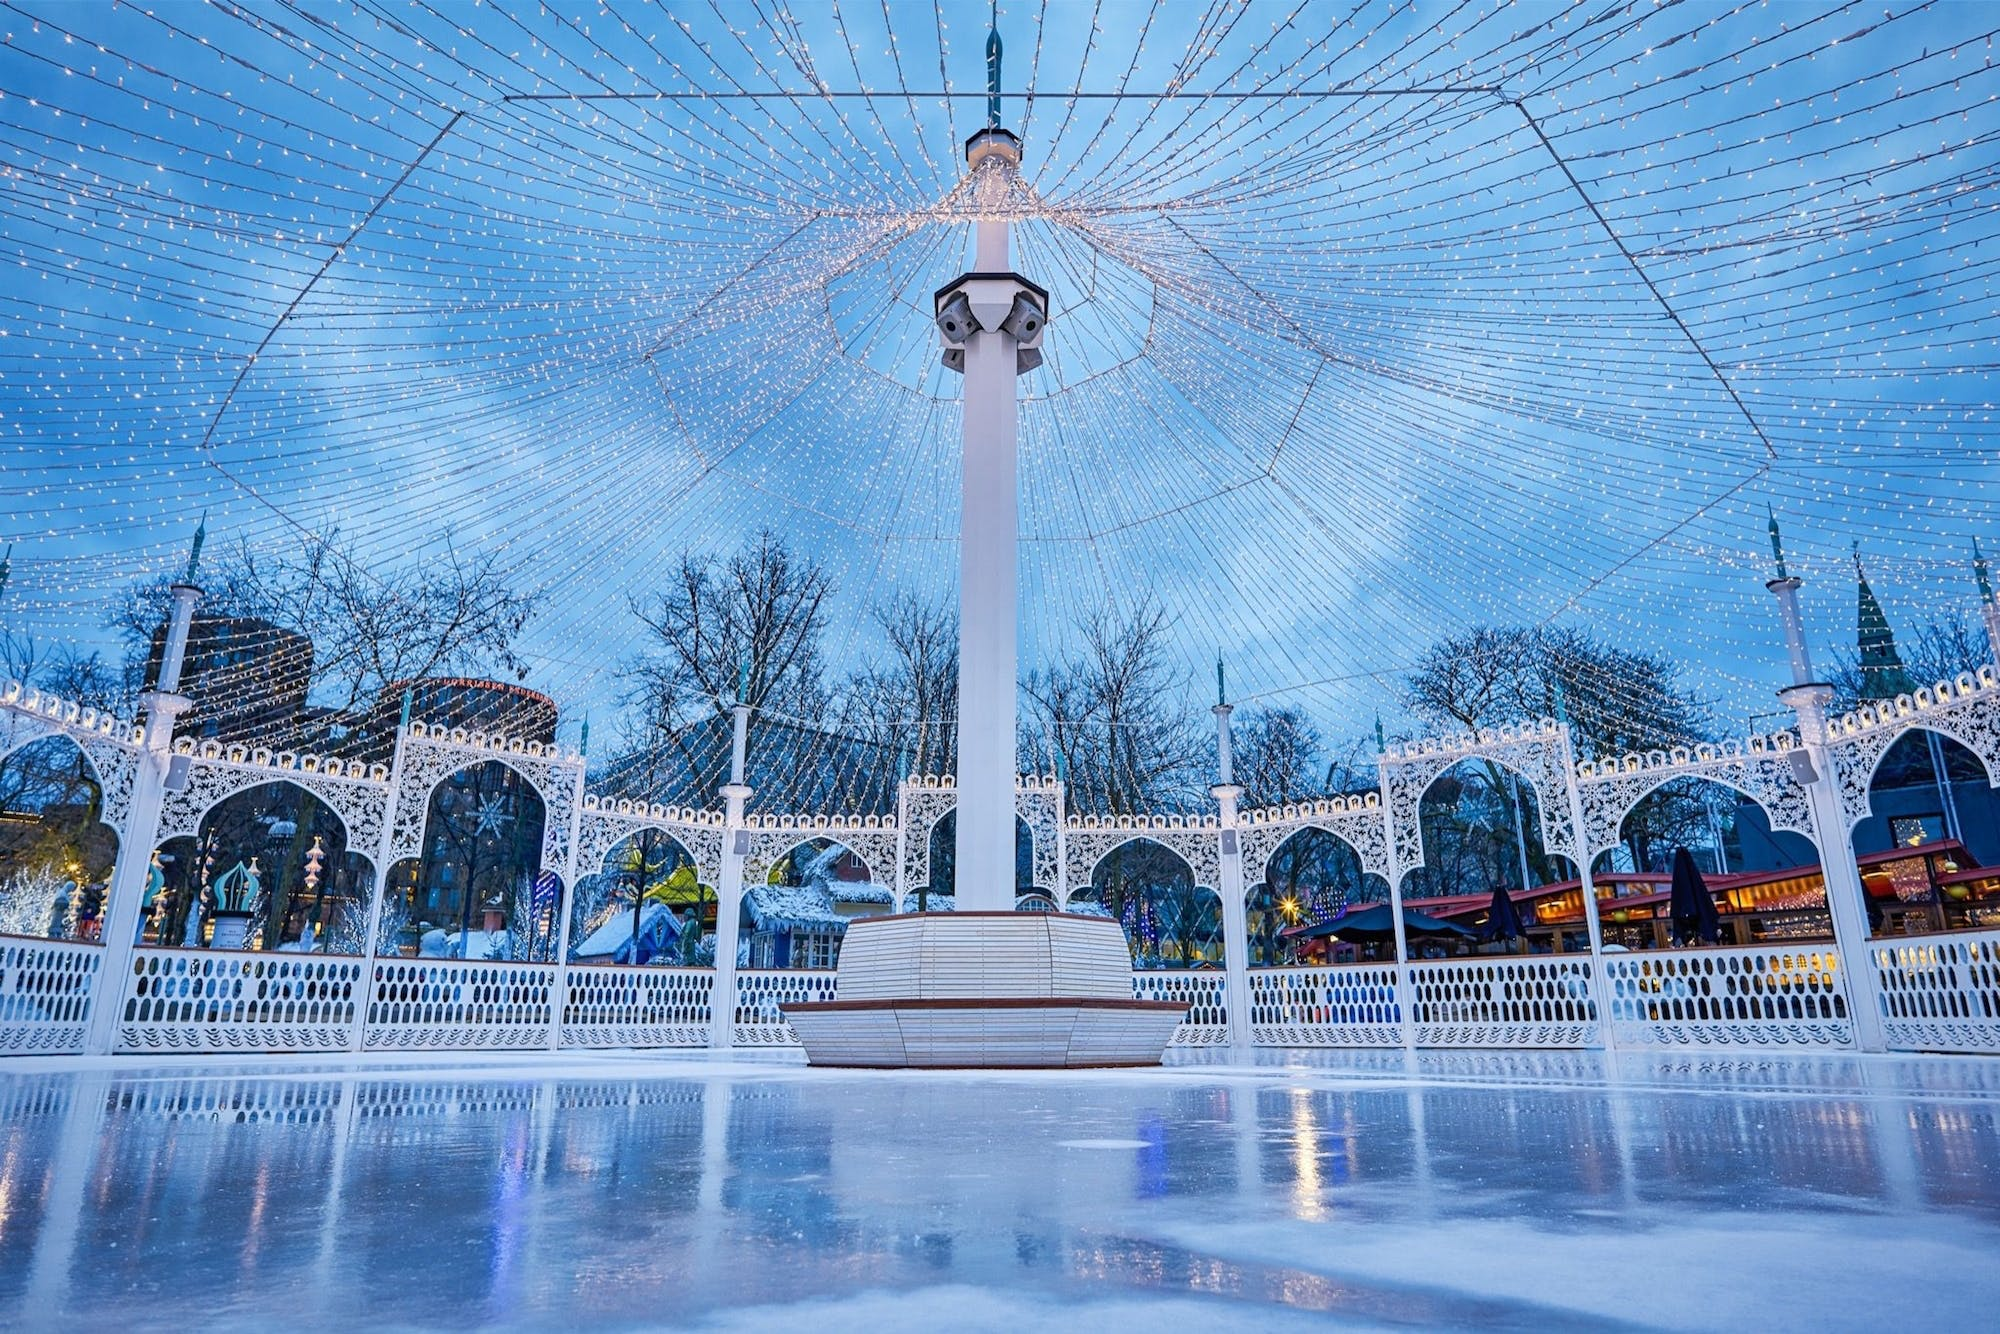 Vinter i Tivoli vintersæson skøjtebane